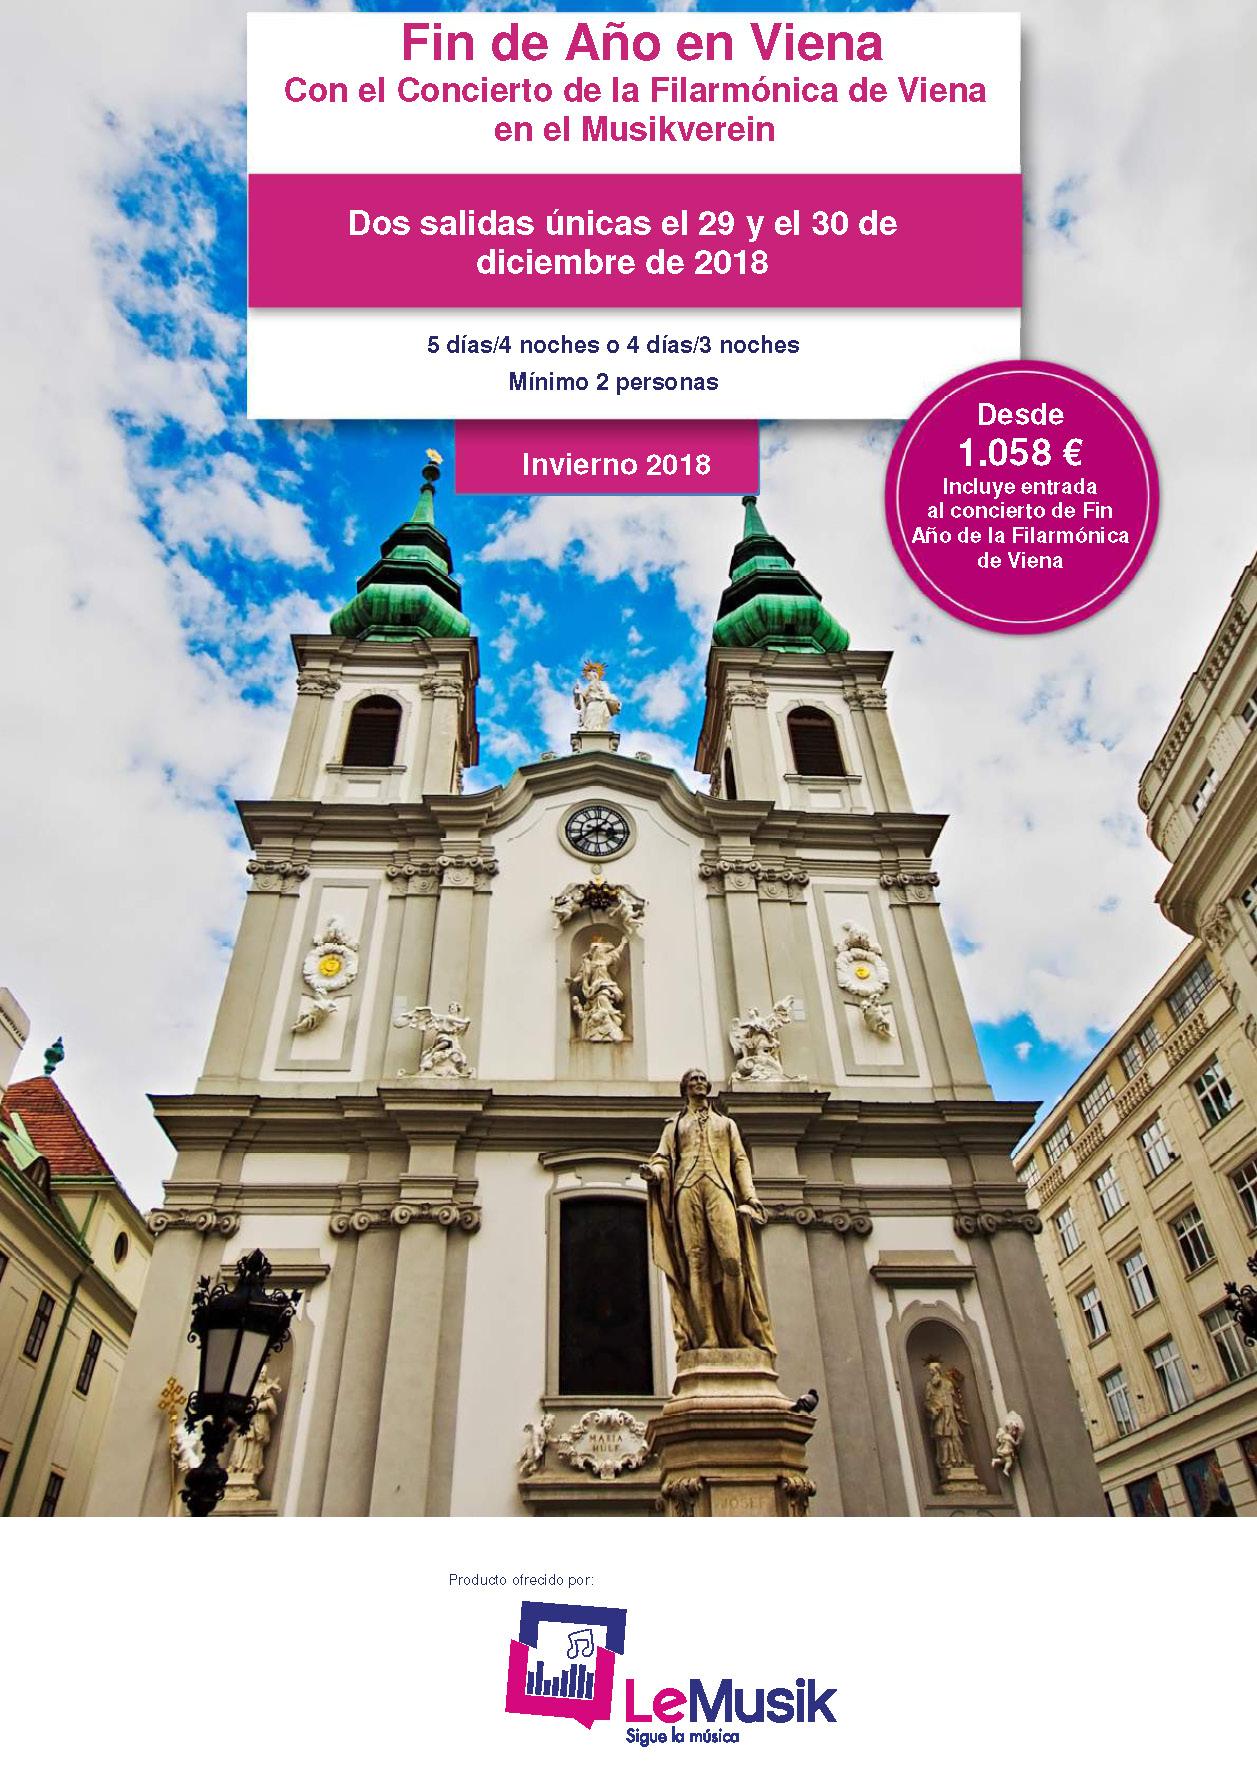 Catalogo Le Musik Fin de Ano en Viena 2018